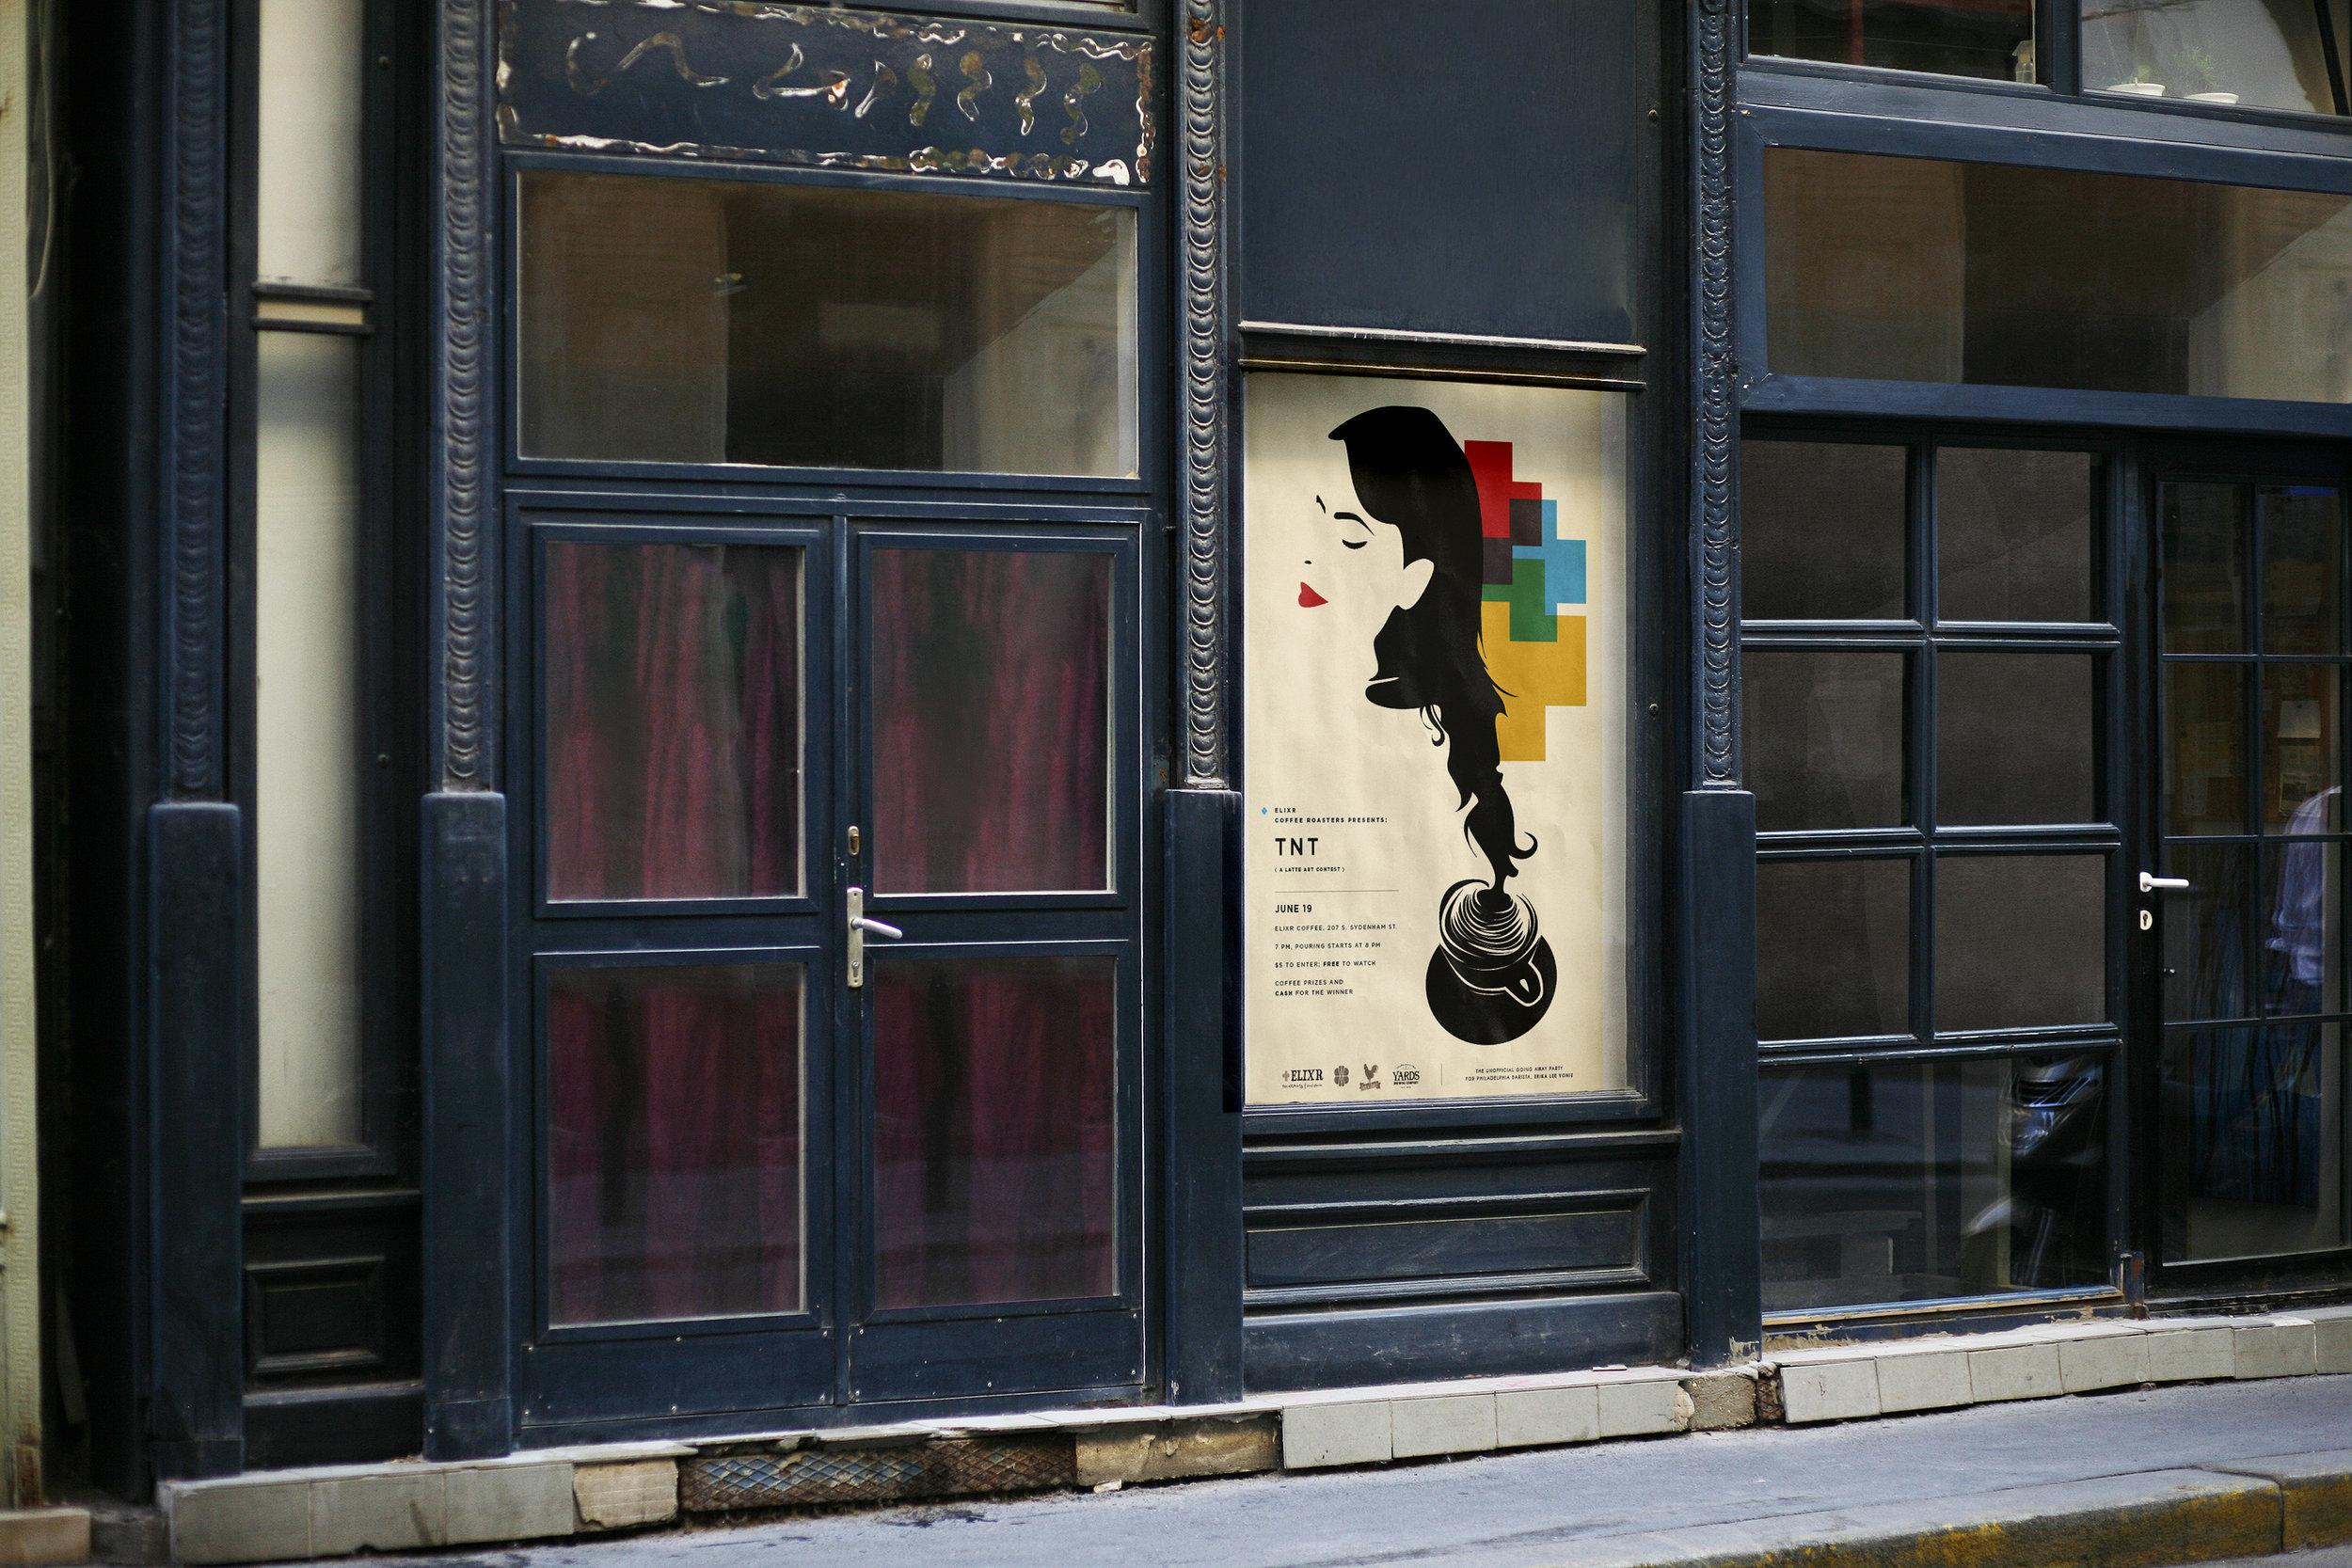 Elixr_Poster_Street2_Mock.jpg